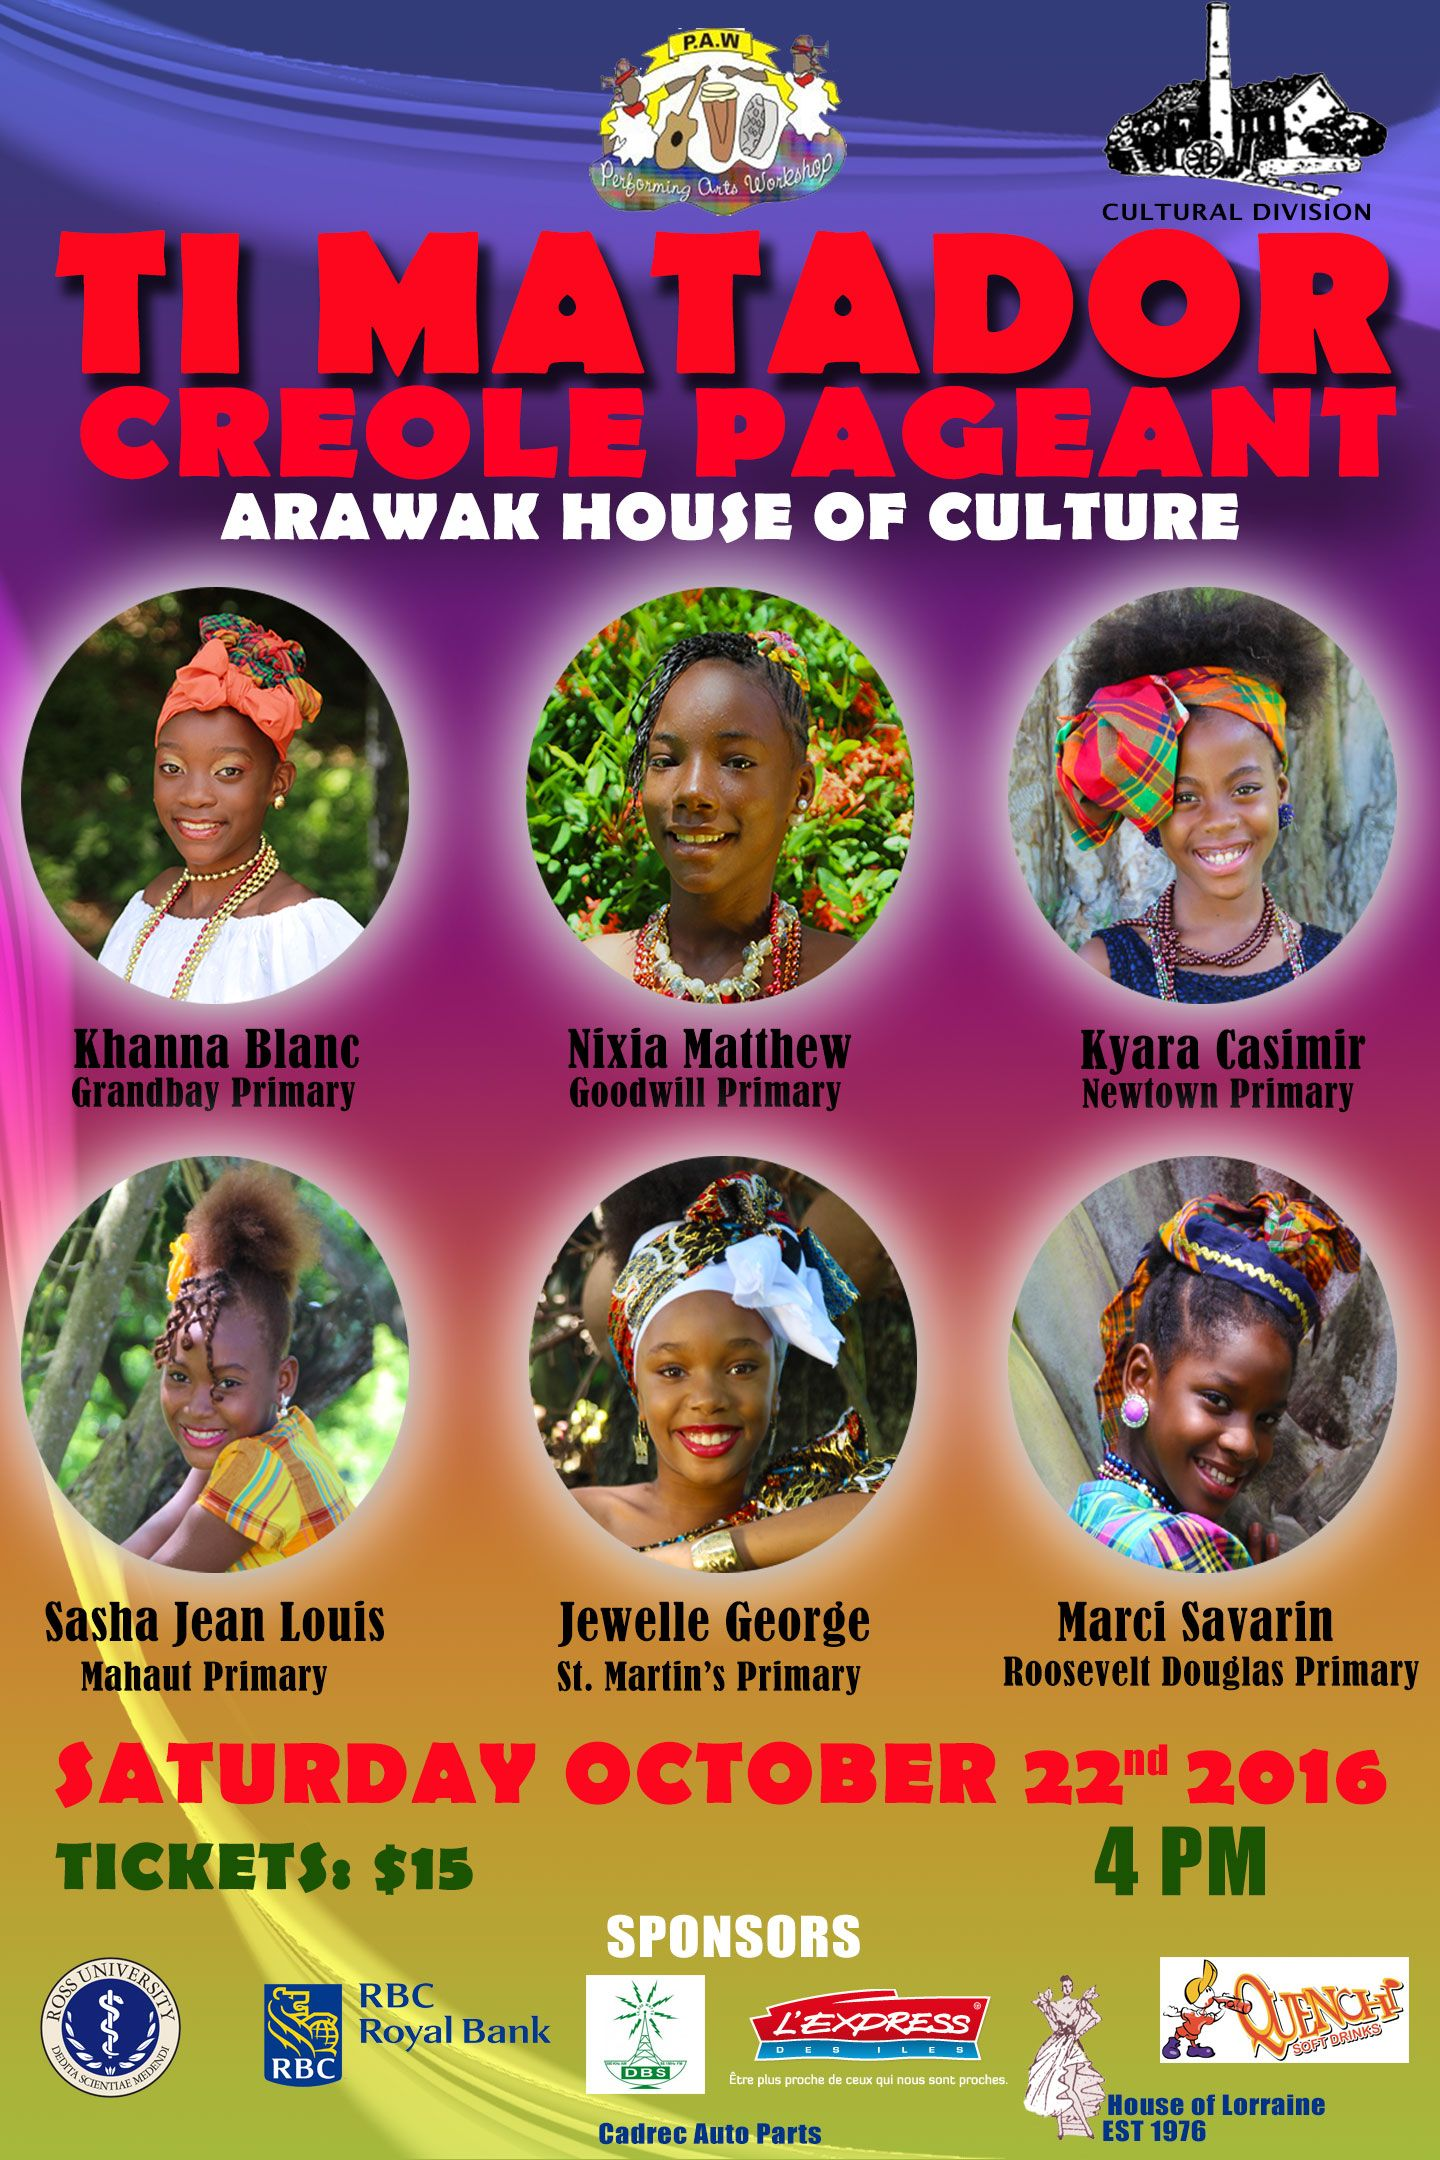 Watch the Ti Matador Creole Pageant 2016